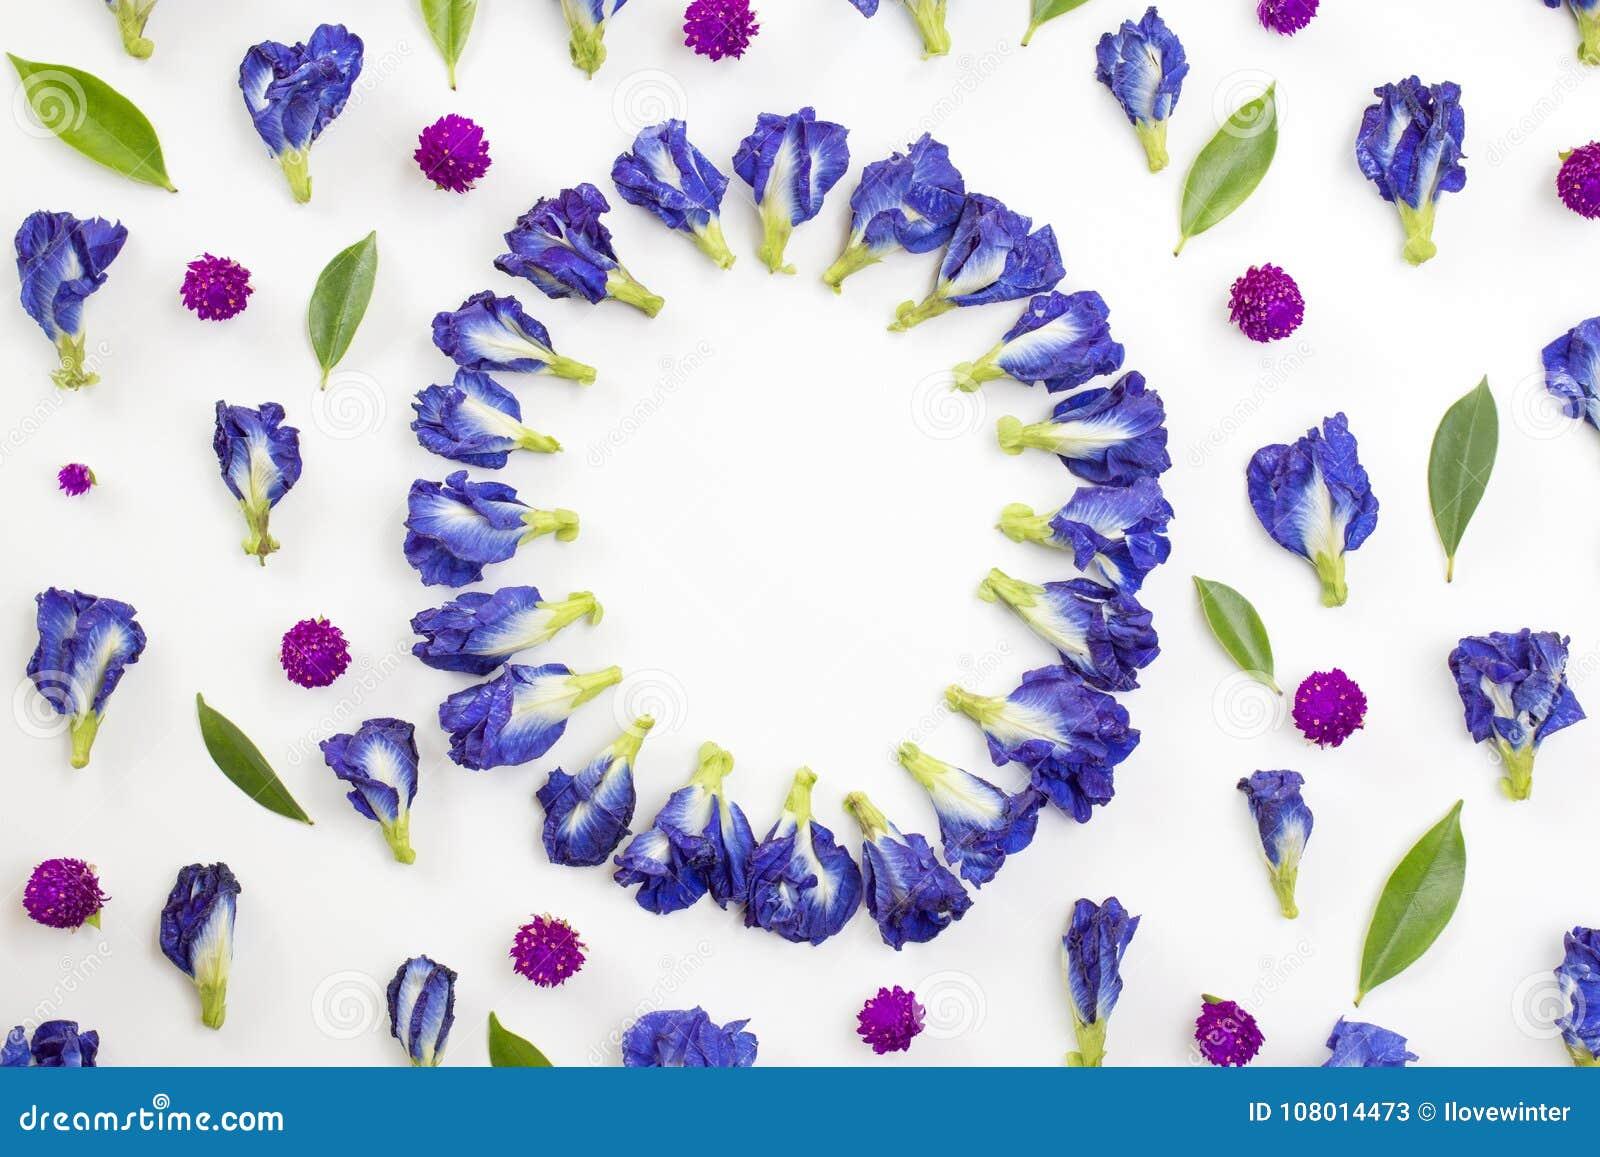 Circle Frame Of Blue Pea And Globe Amaranth Flowers Stock Image ...